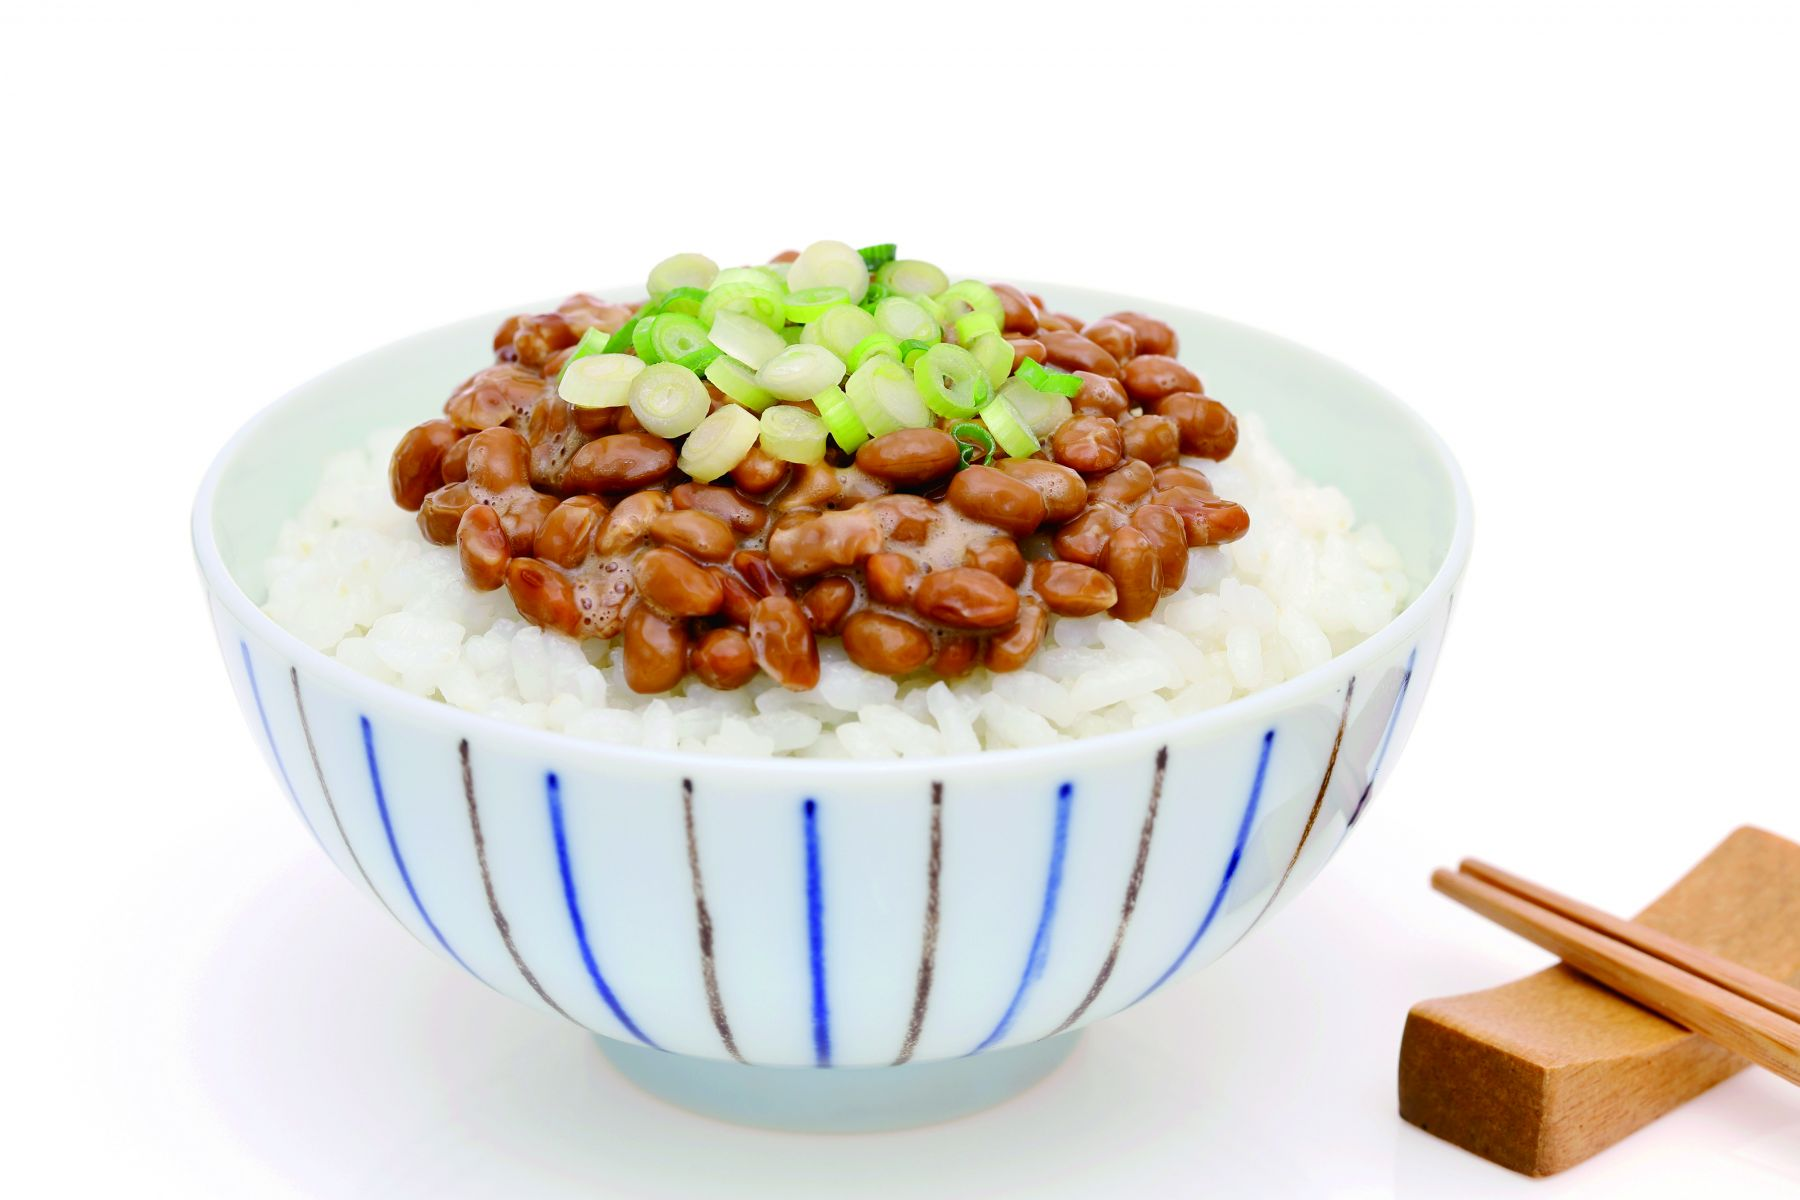 大豆 素食